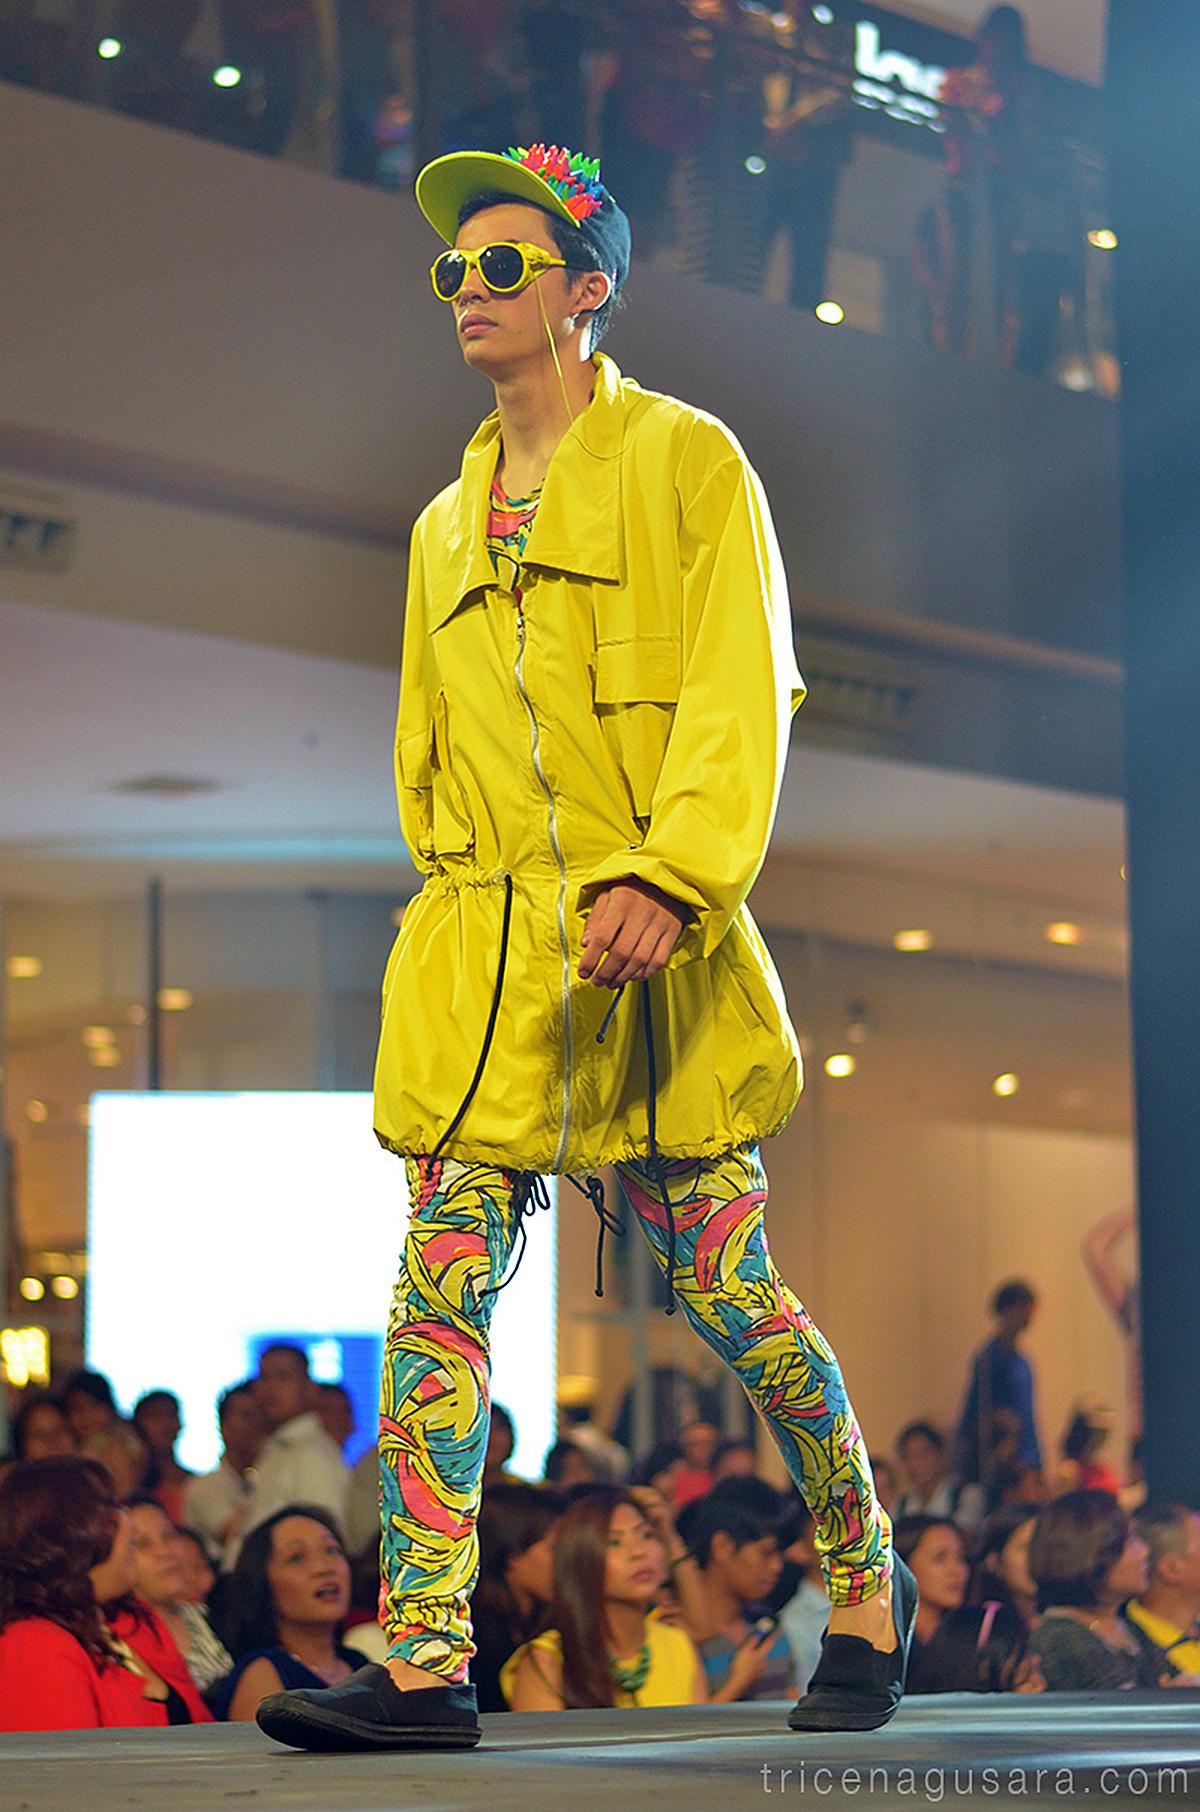 Trice Nagusara La Petite Style Origin 10